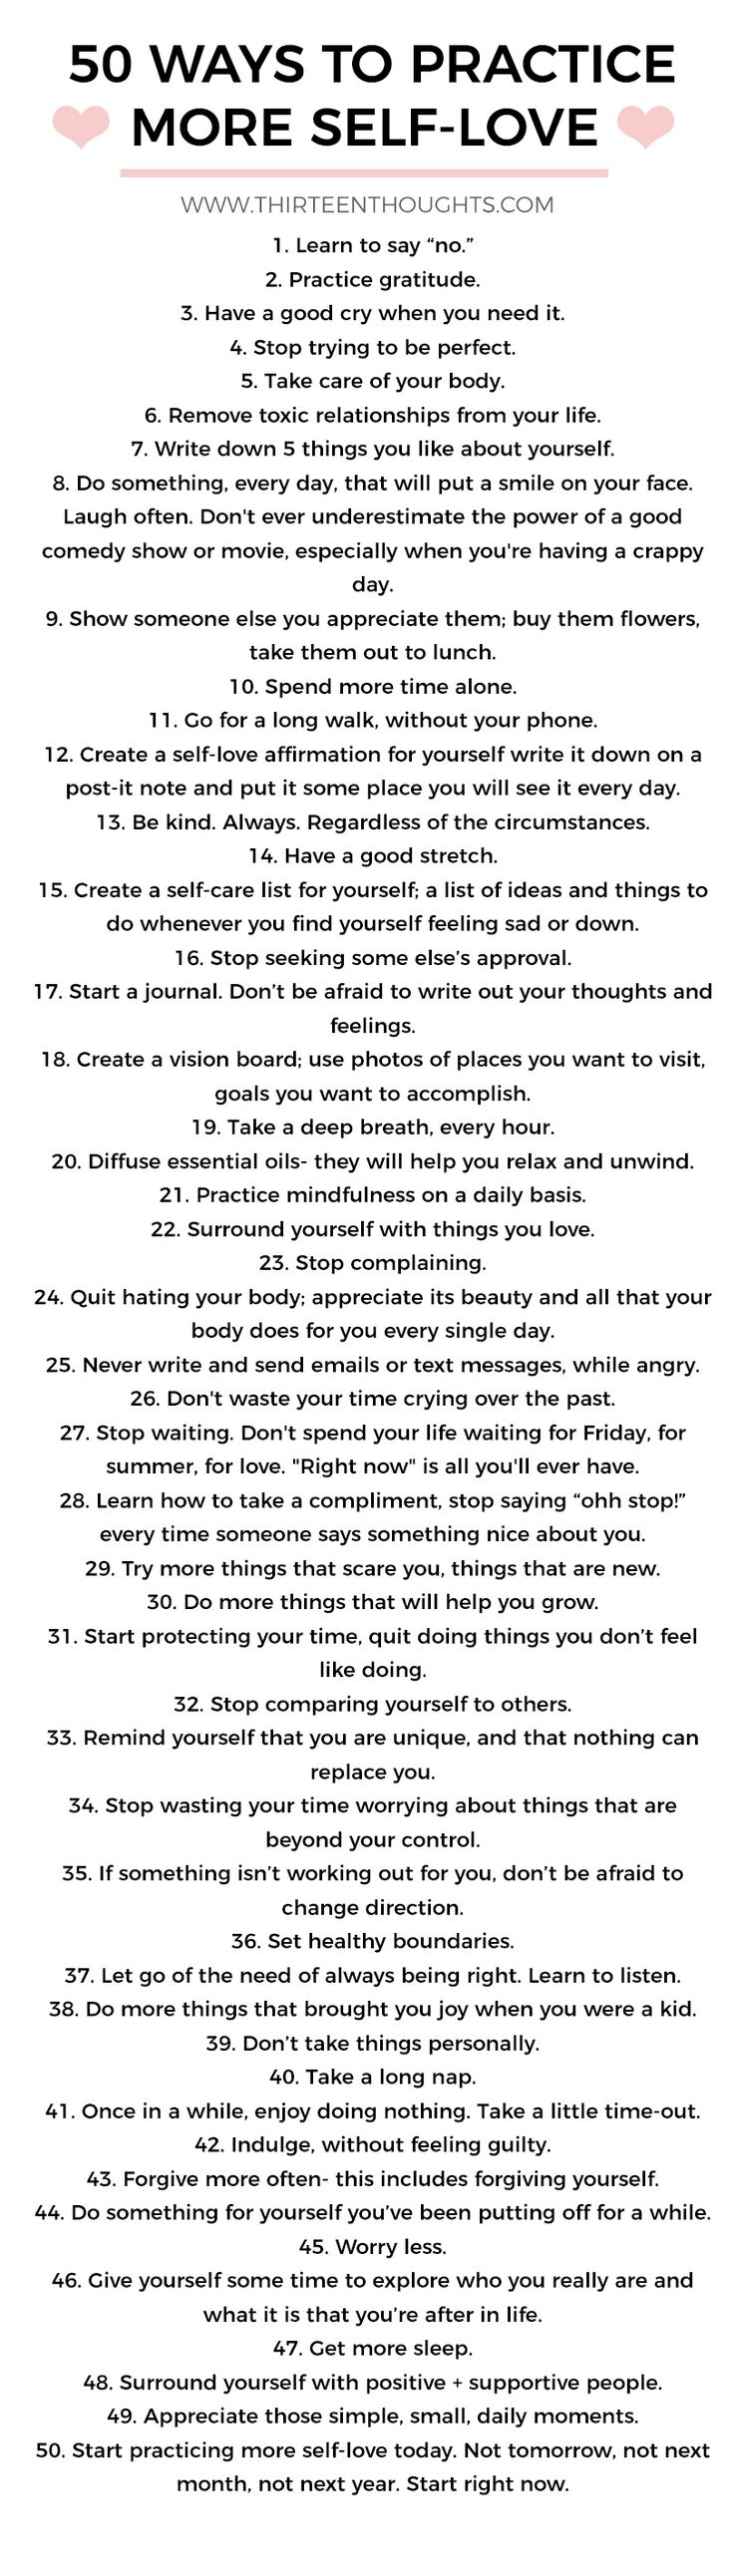 #love #selflove #selfcare #wellness #selfgrwoth #lifestyle #selfloveideas #girltalk Ways to practice self-love.  via @Paula13t